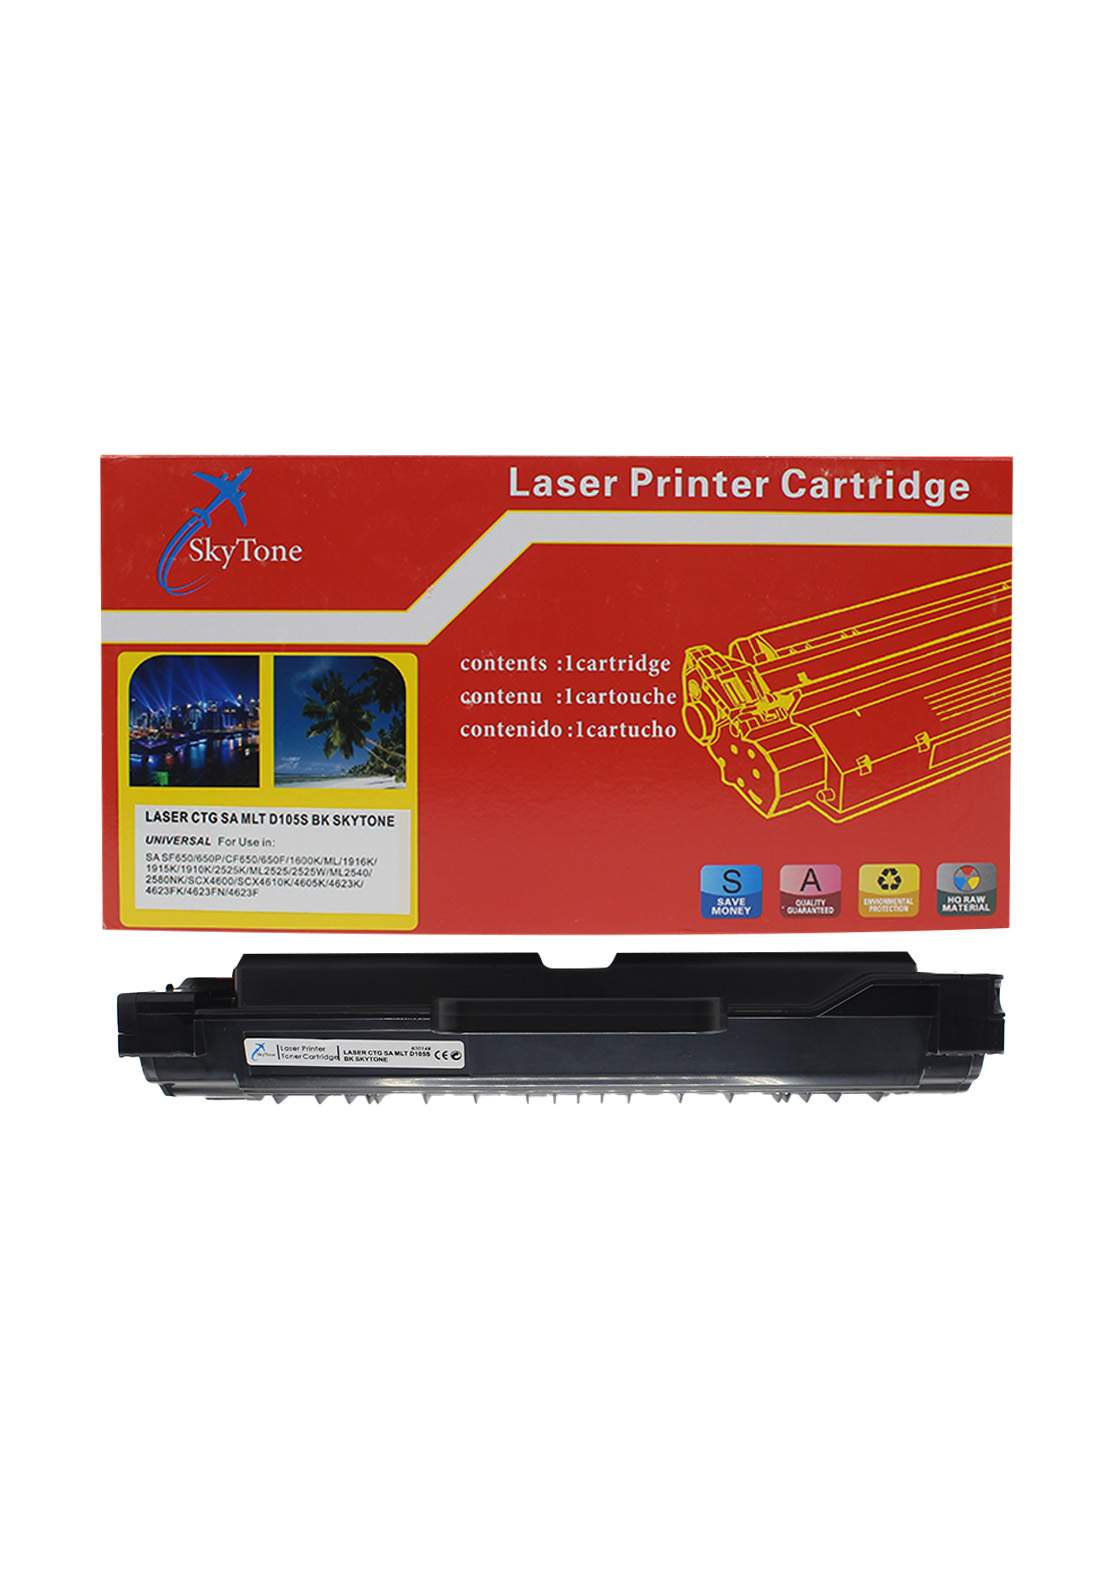 SKYTONE CTG Samsung Mlt D105 Laser Printer Toner Cartridge خرطوشة حبر